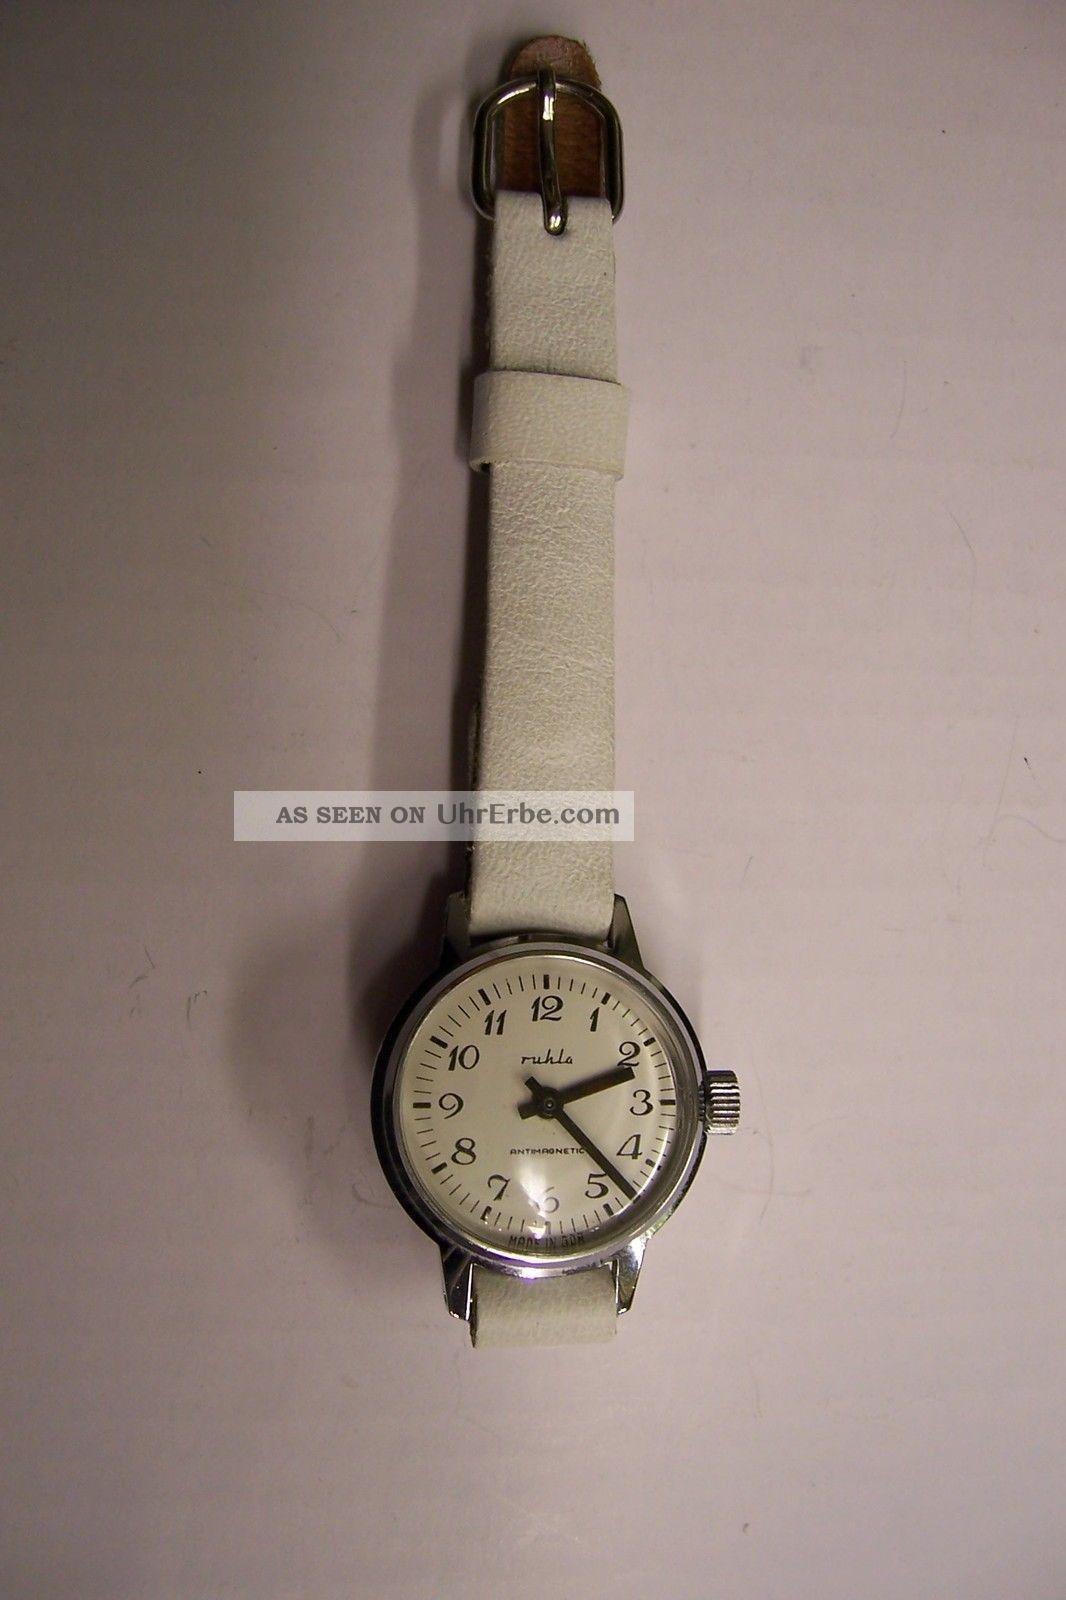 Orig.  Ddr Kinderuhr Mechan.  Ruhla Kinder Armbanduhr Analog M.  Lederarmband Armbanduhren Bild